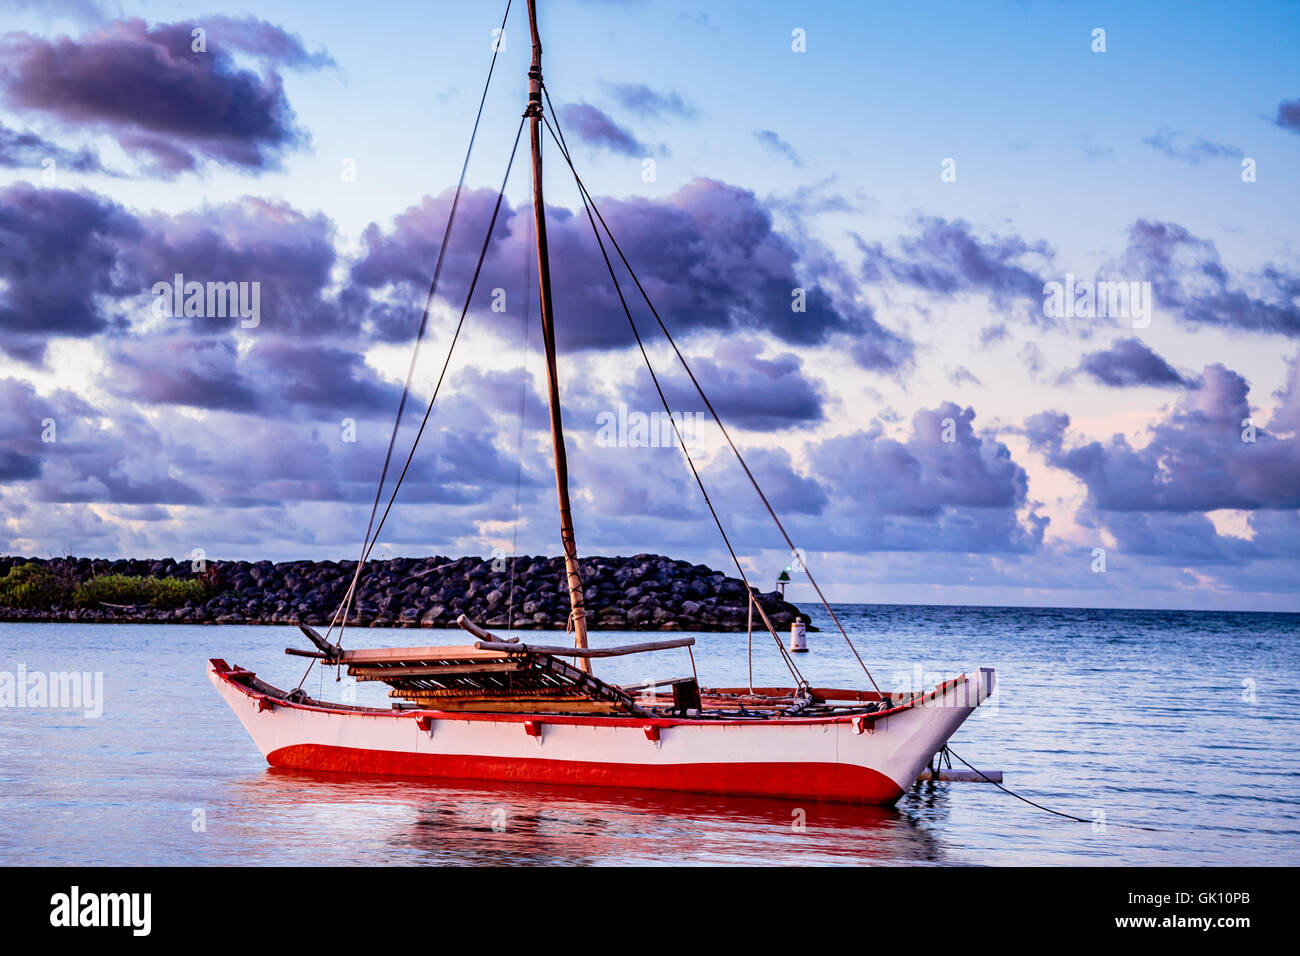 A micronesian tribal catamaran at anchor at the mouth of the bay. - Stock Image